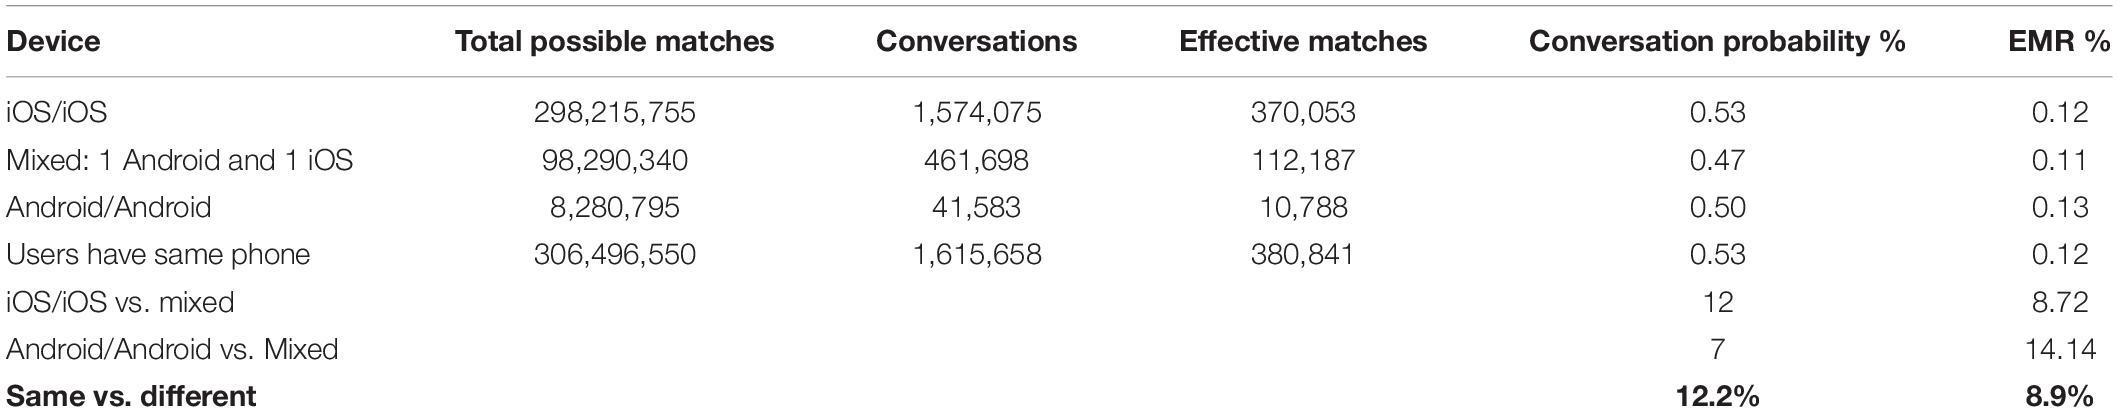 topp mobila dating apps 2014 topp tre gratis dejtingsajter